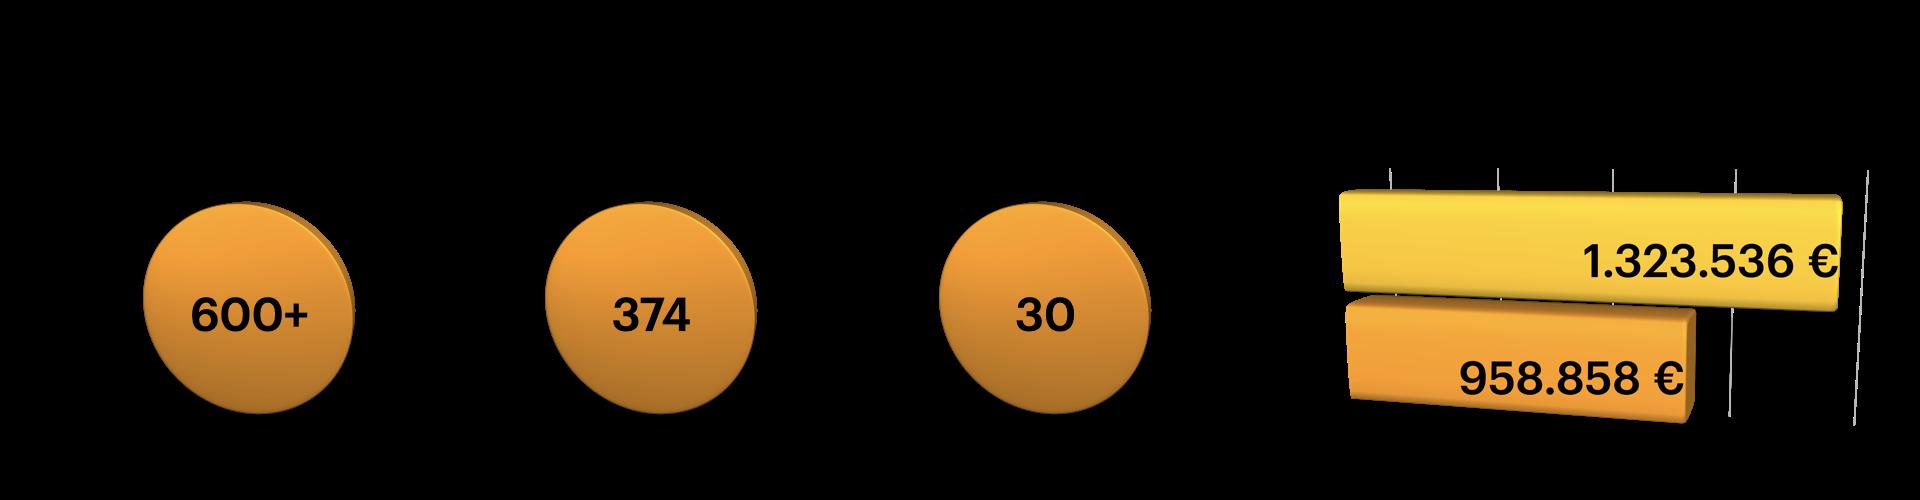 Grafiche statistiche_28 5_EN